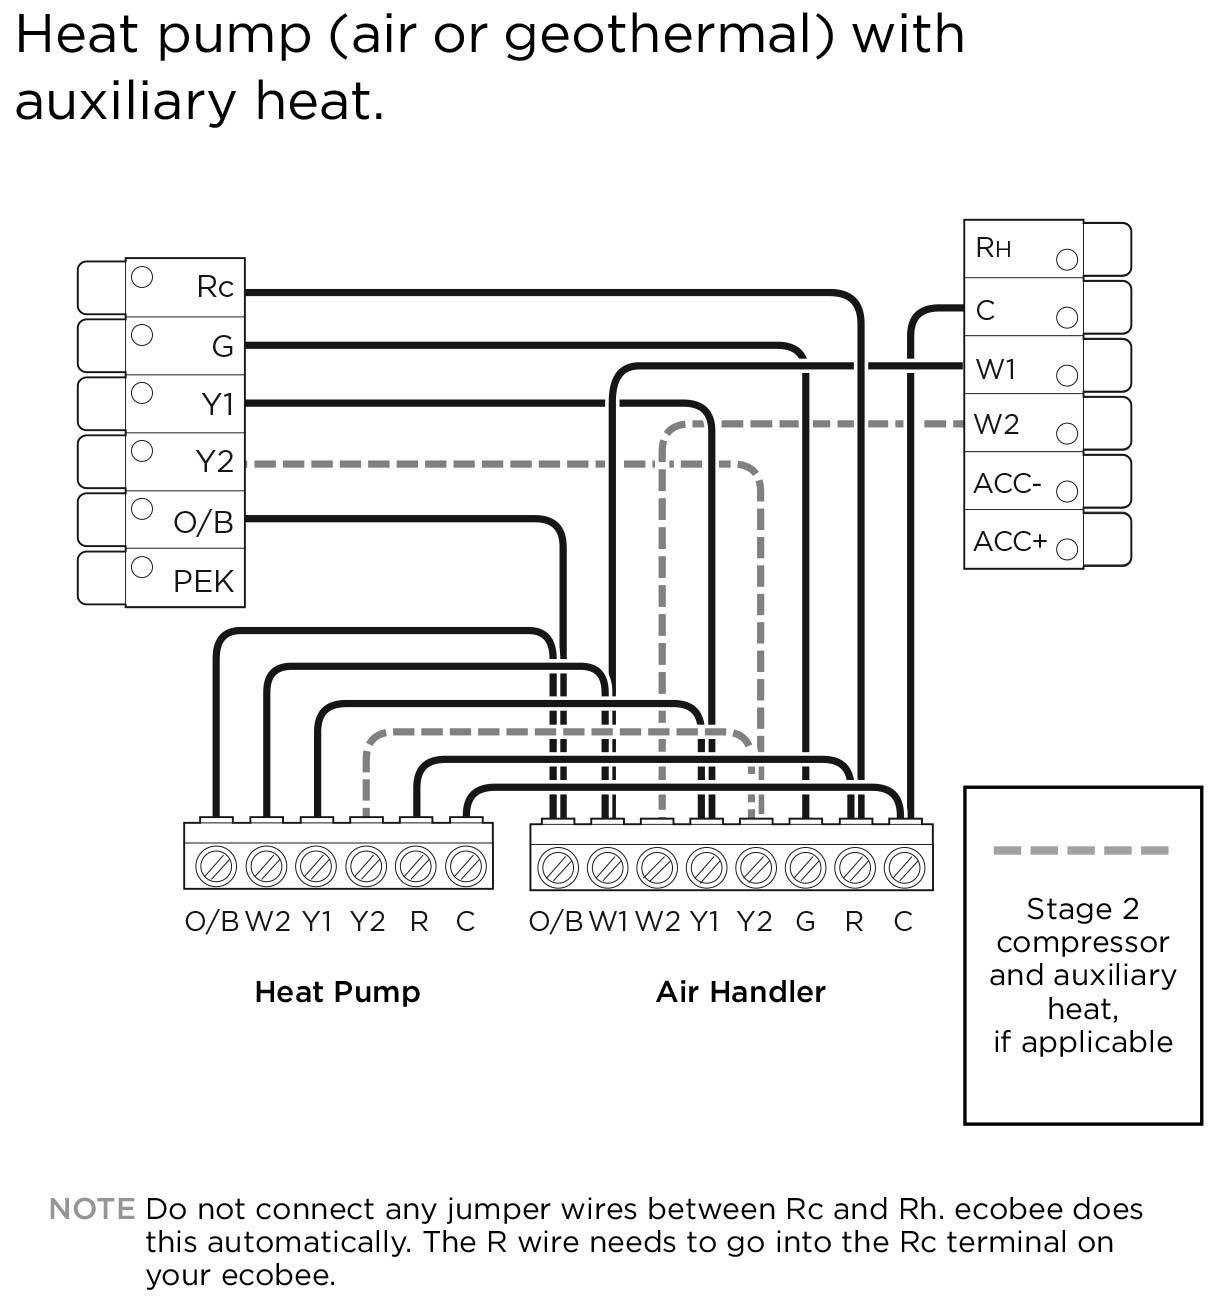 Peachy Geothermal Wiring Diagram Wiring Diagram Wiring 101 Capemaxxcnl